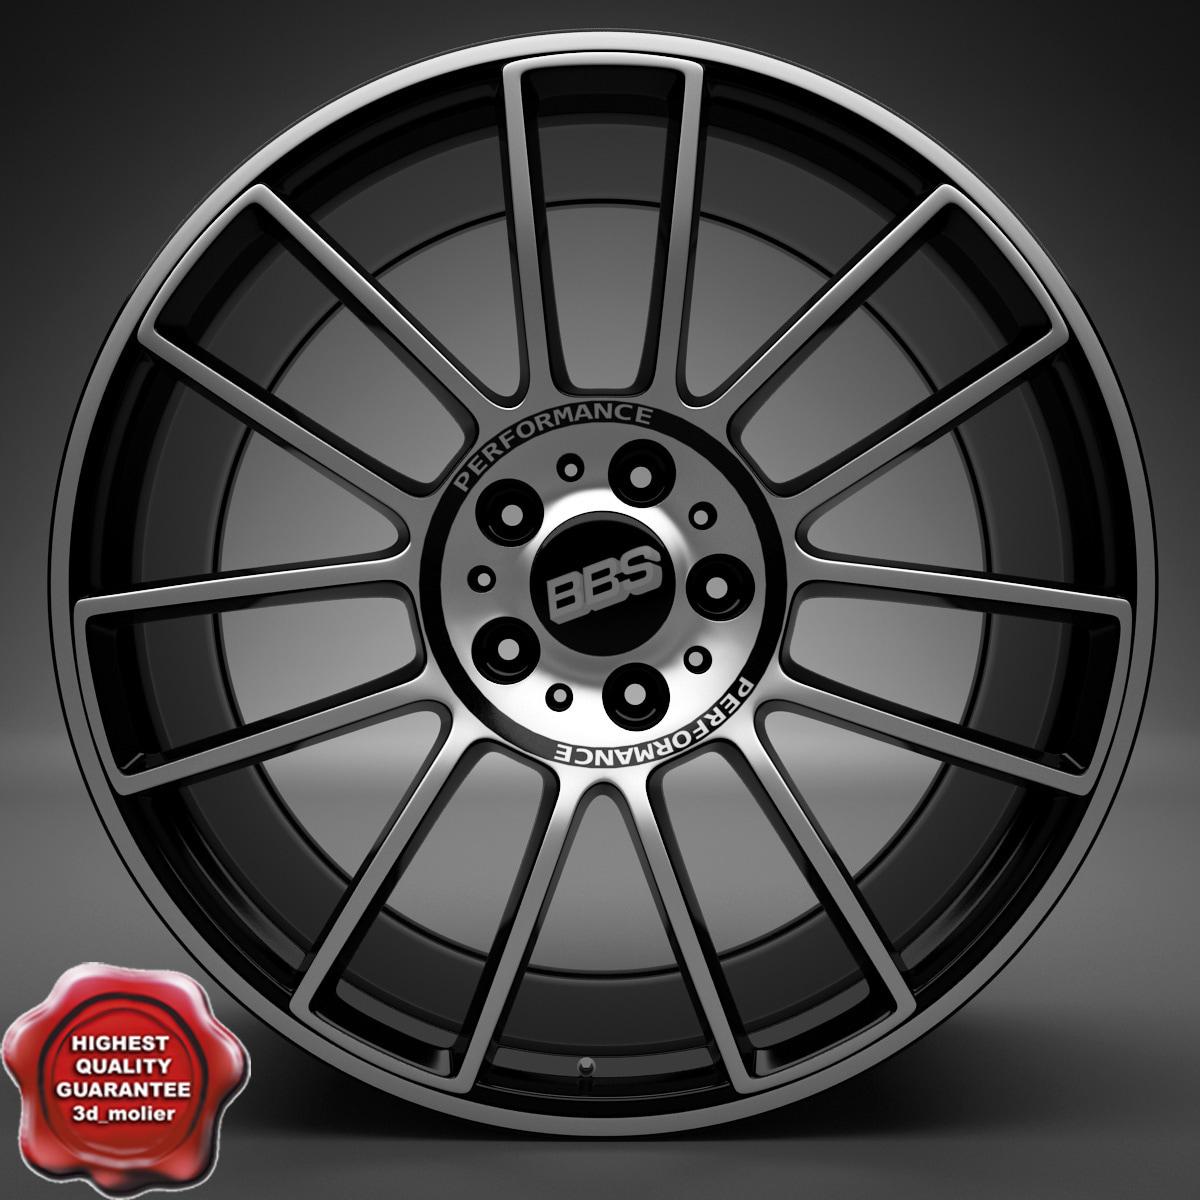 Auto_Wheel_Trim_BBS_cm_00.jpg